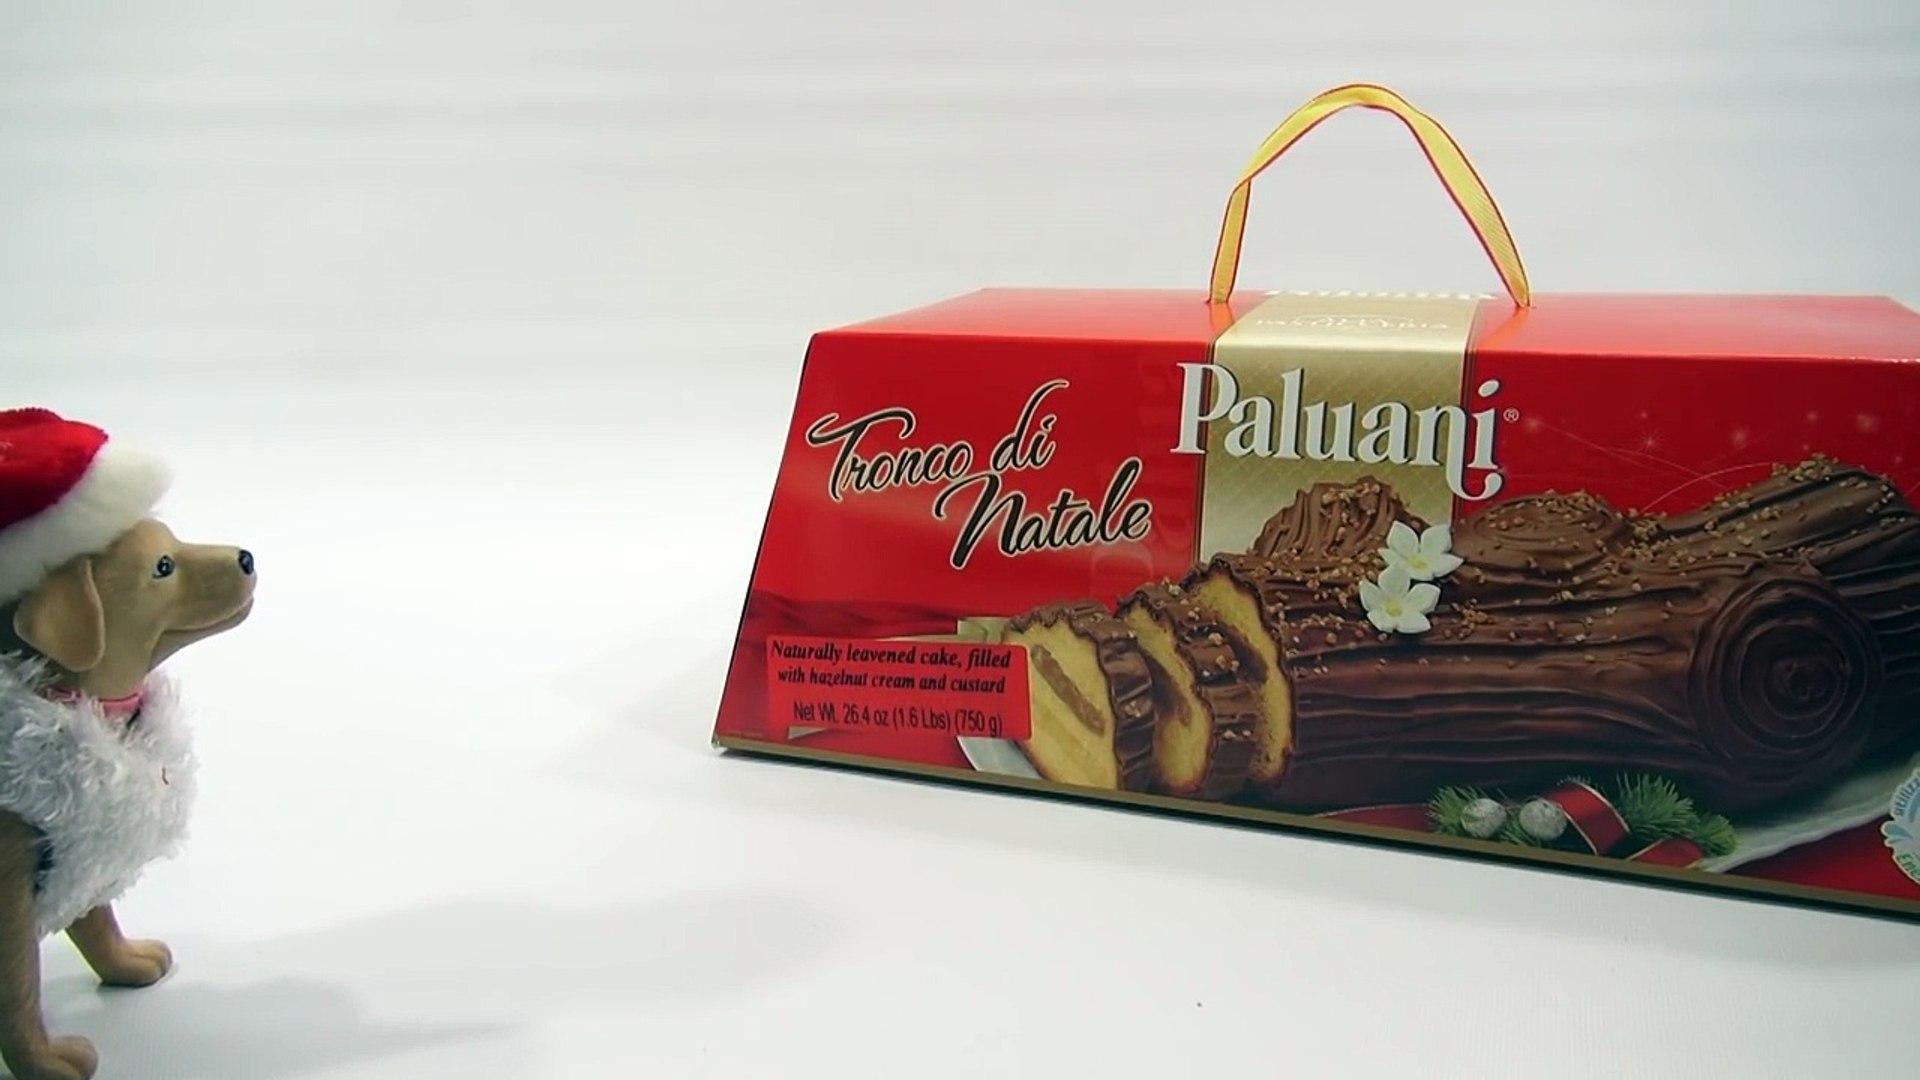 Tronco Di Natale Youtube.Paluani Tronco Di Natale Cake Holiday Christmas Yule Log Dessert Yellow Cake Covered In Chocolate